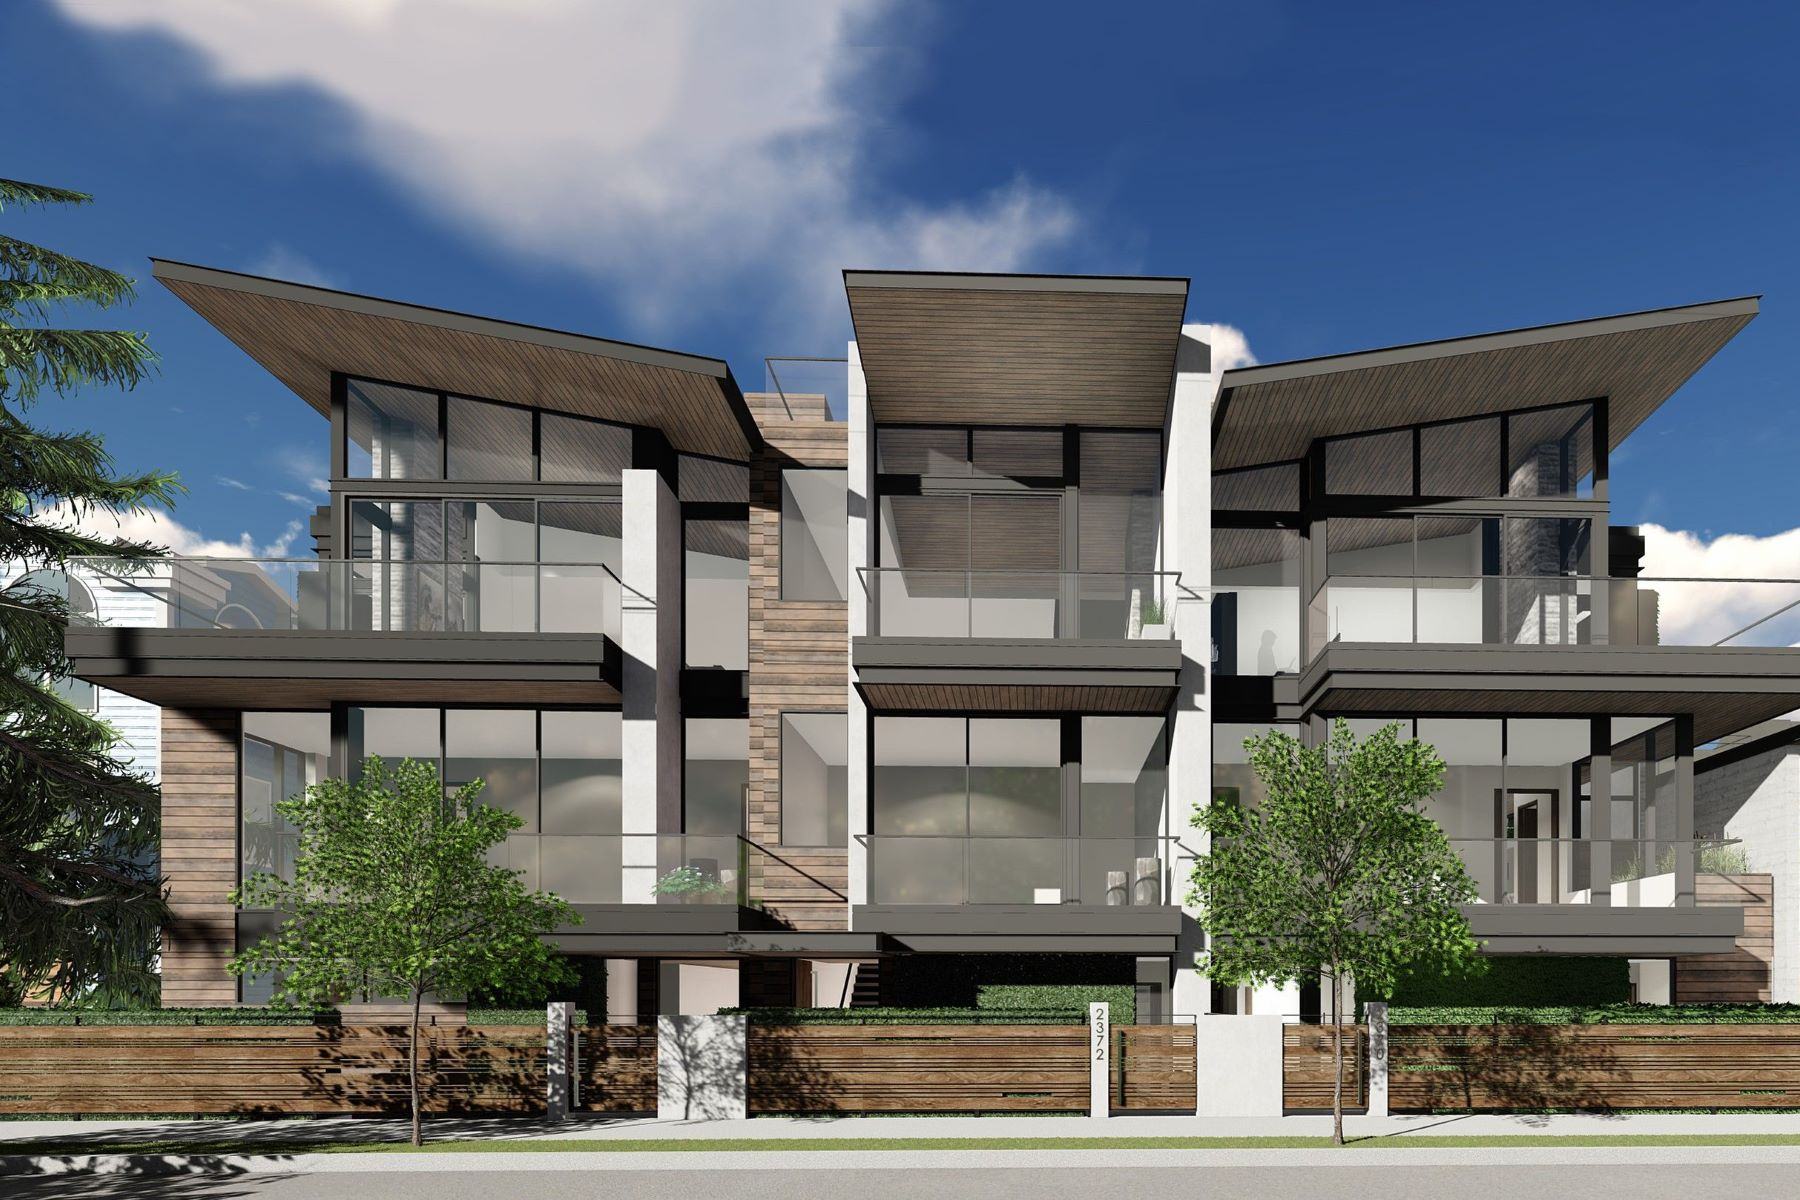 Single Family Homes for Sale at 2370 Fairview Ave E Unit #5, Seattle, WA 98102 Seattle, Washington 98102 United States